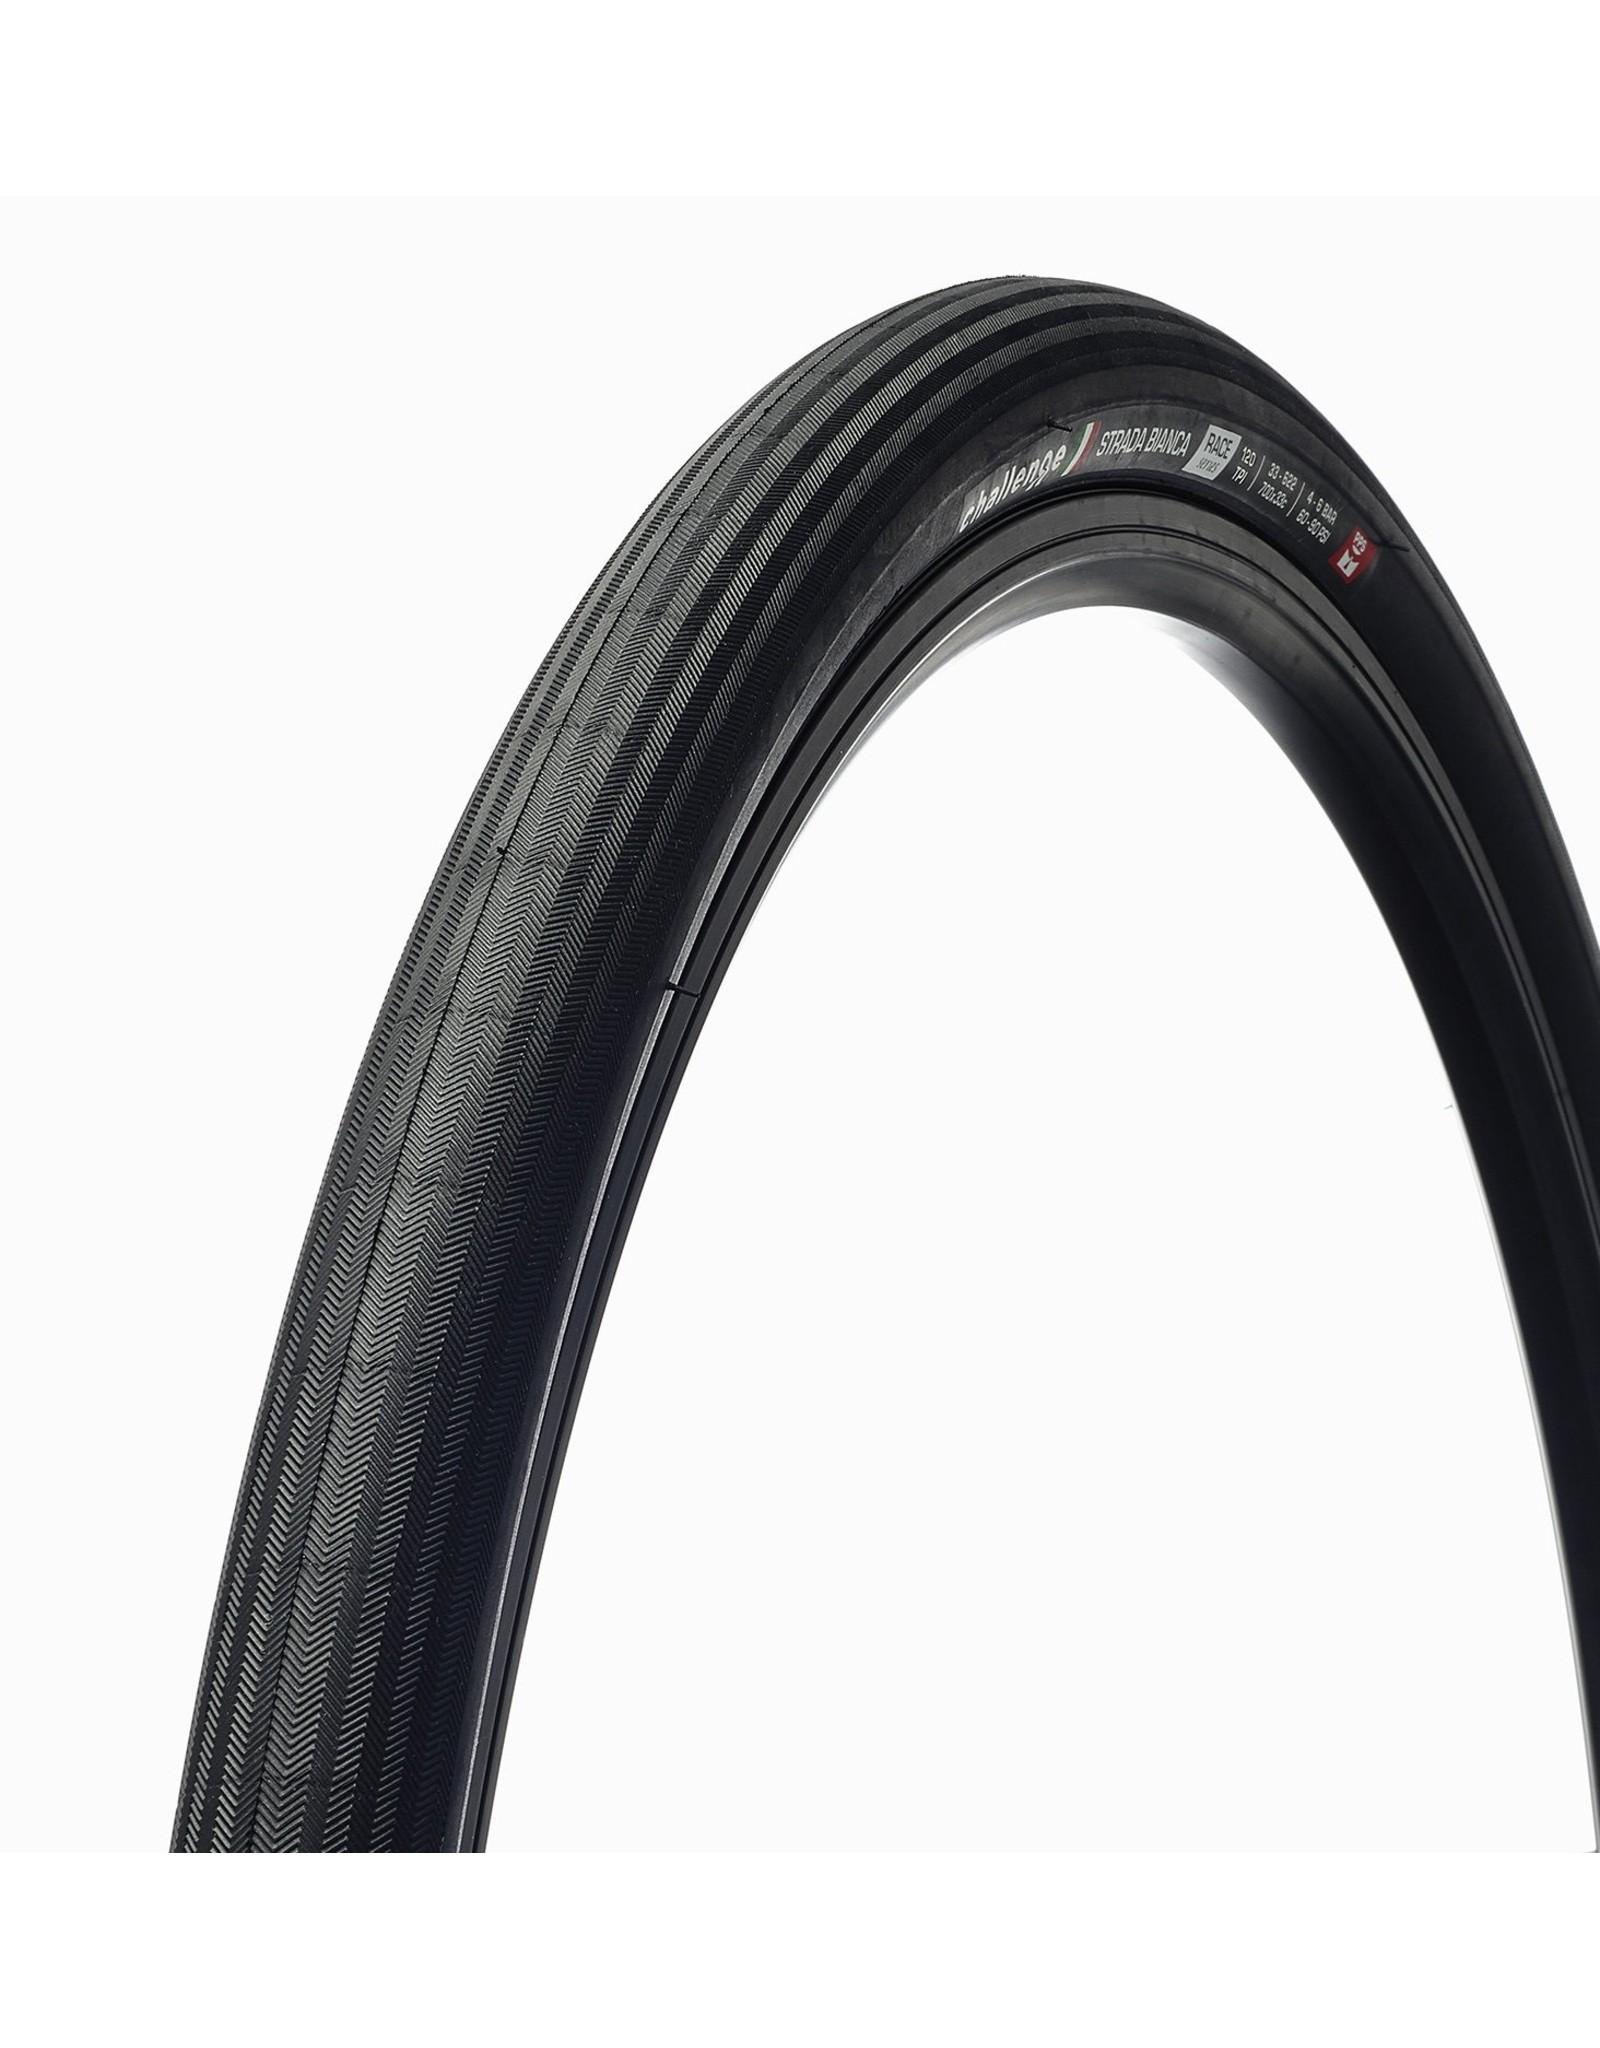 Challenge Tyre Strada Bianca 120 700 x 33